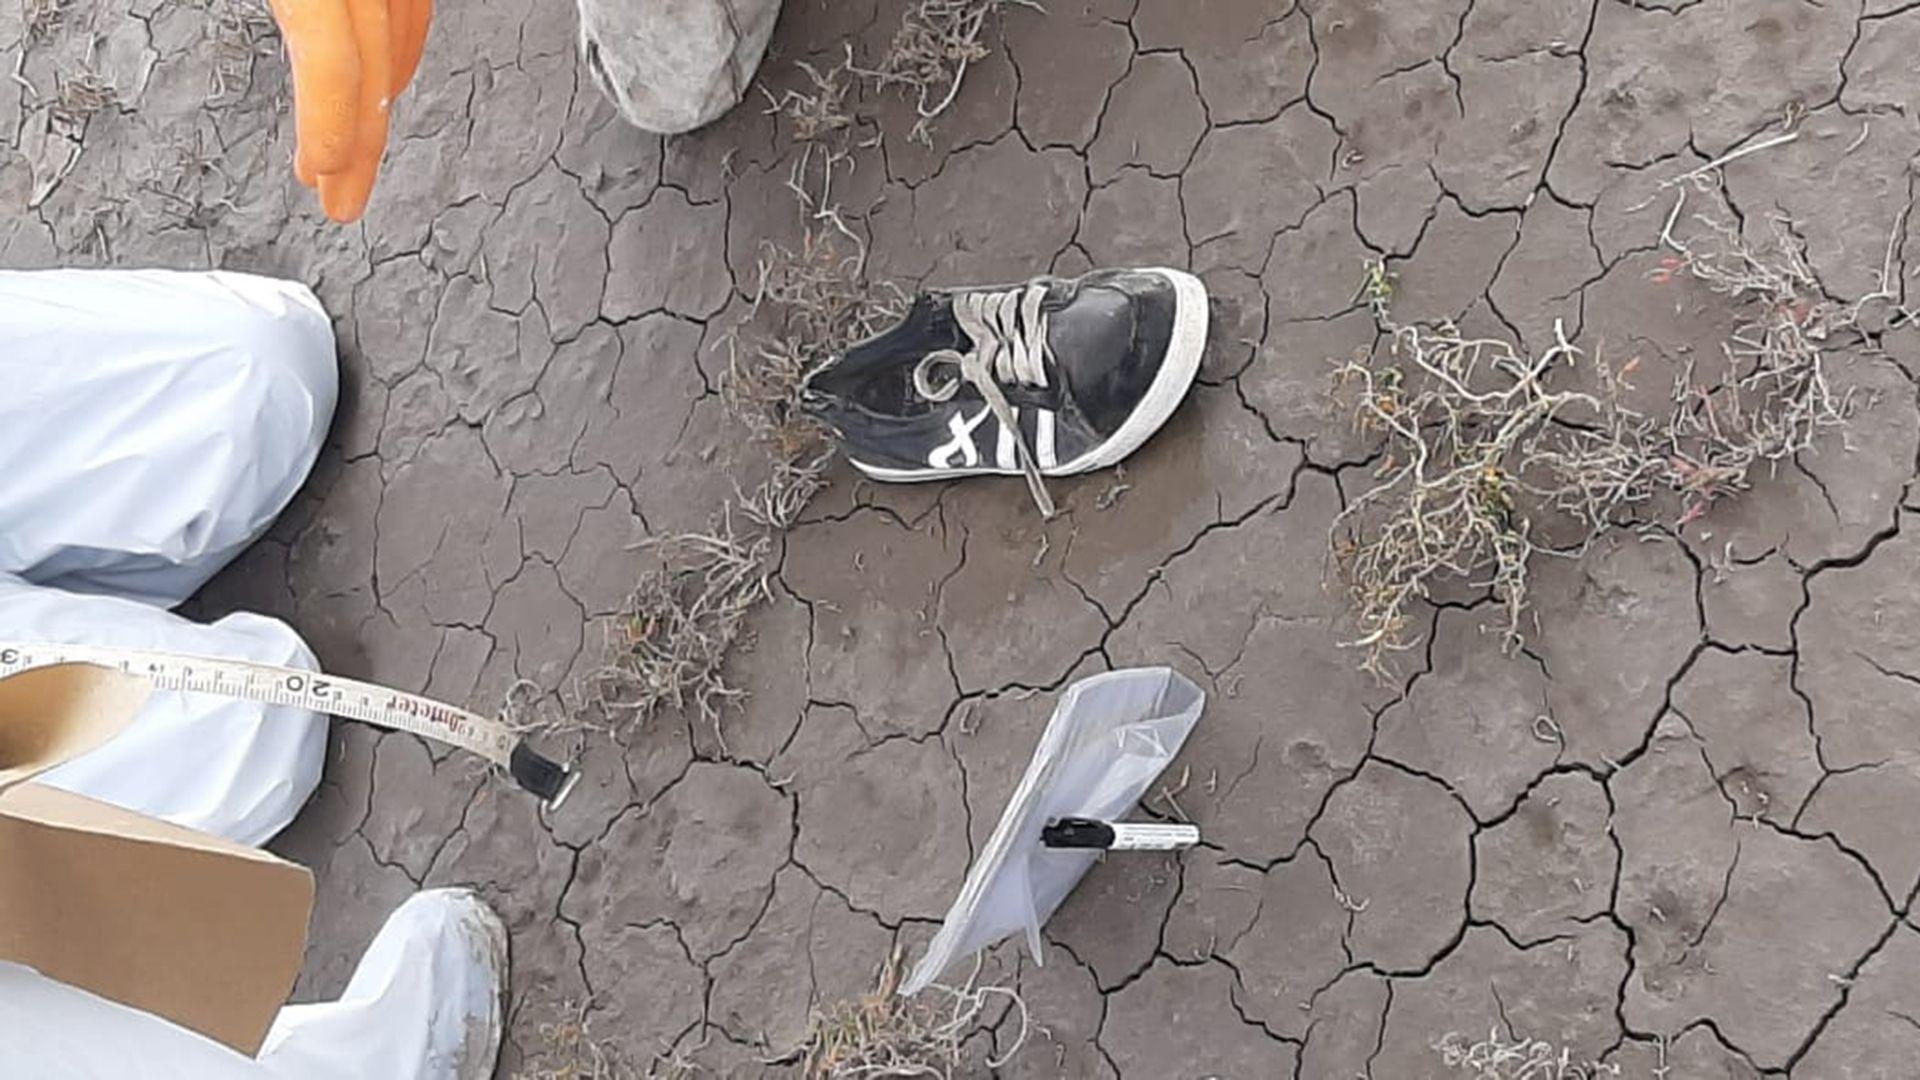 zapatillas de facundo castro